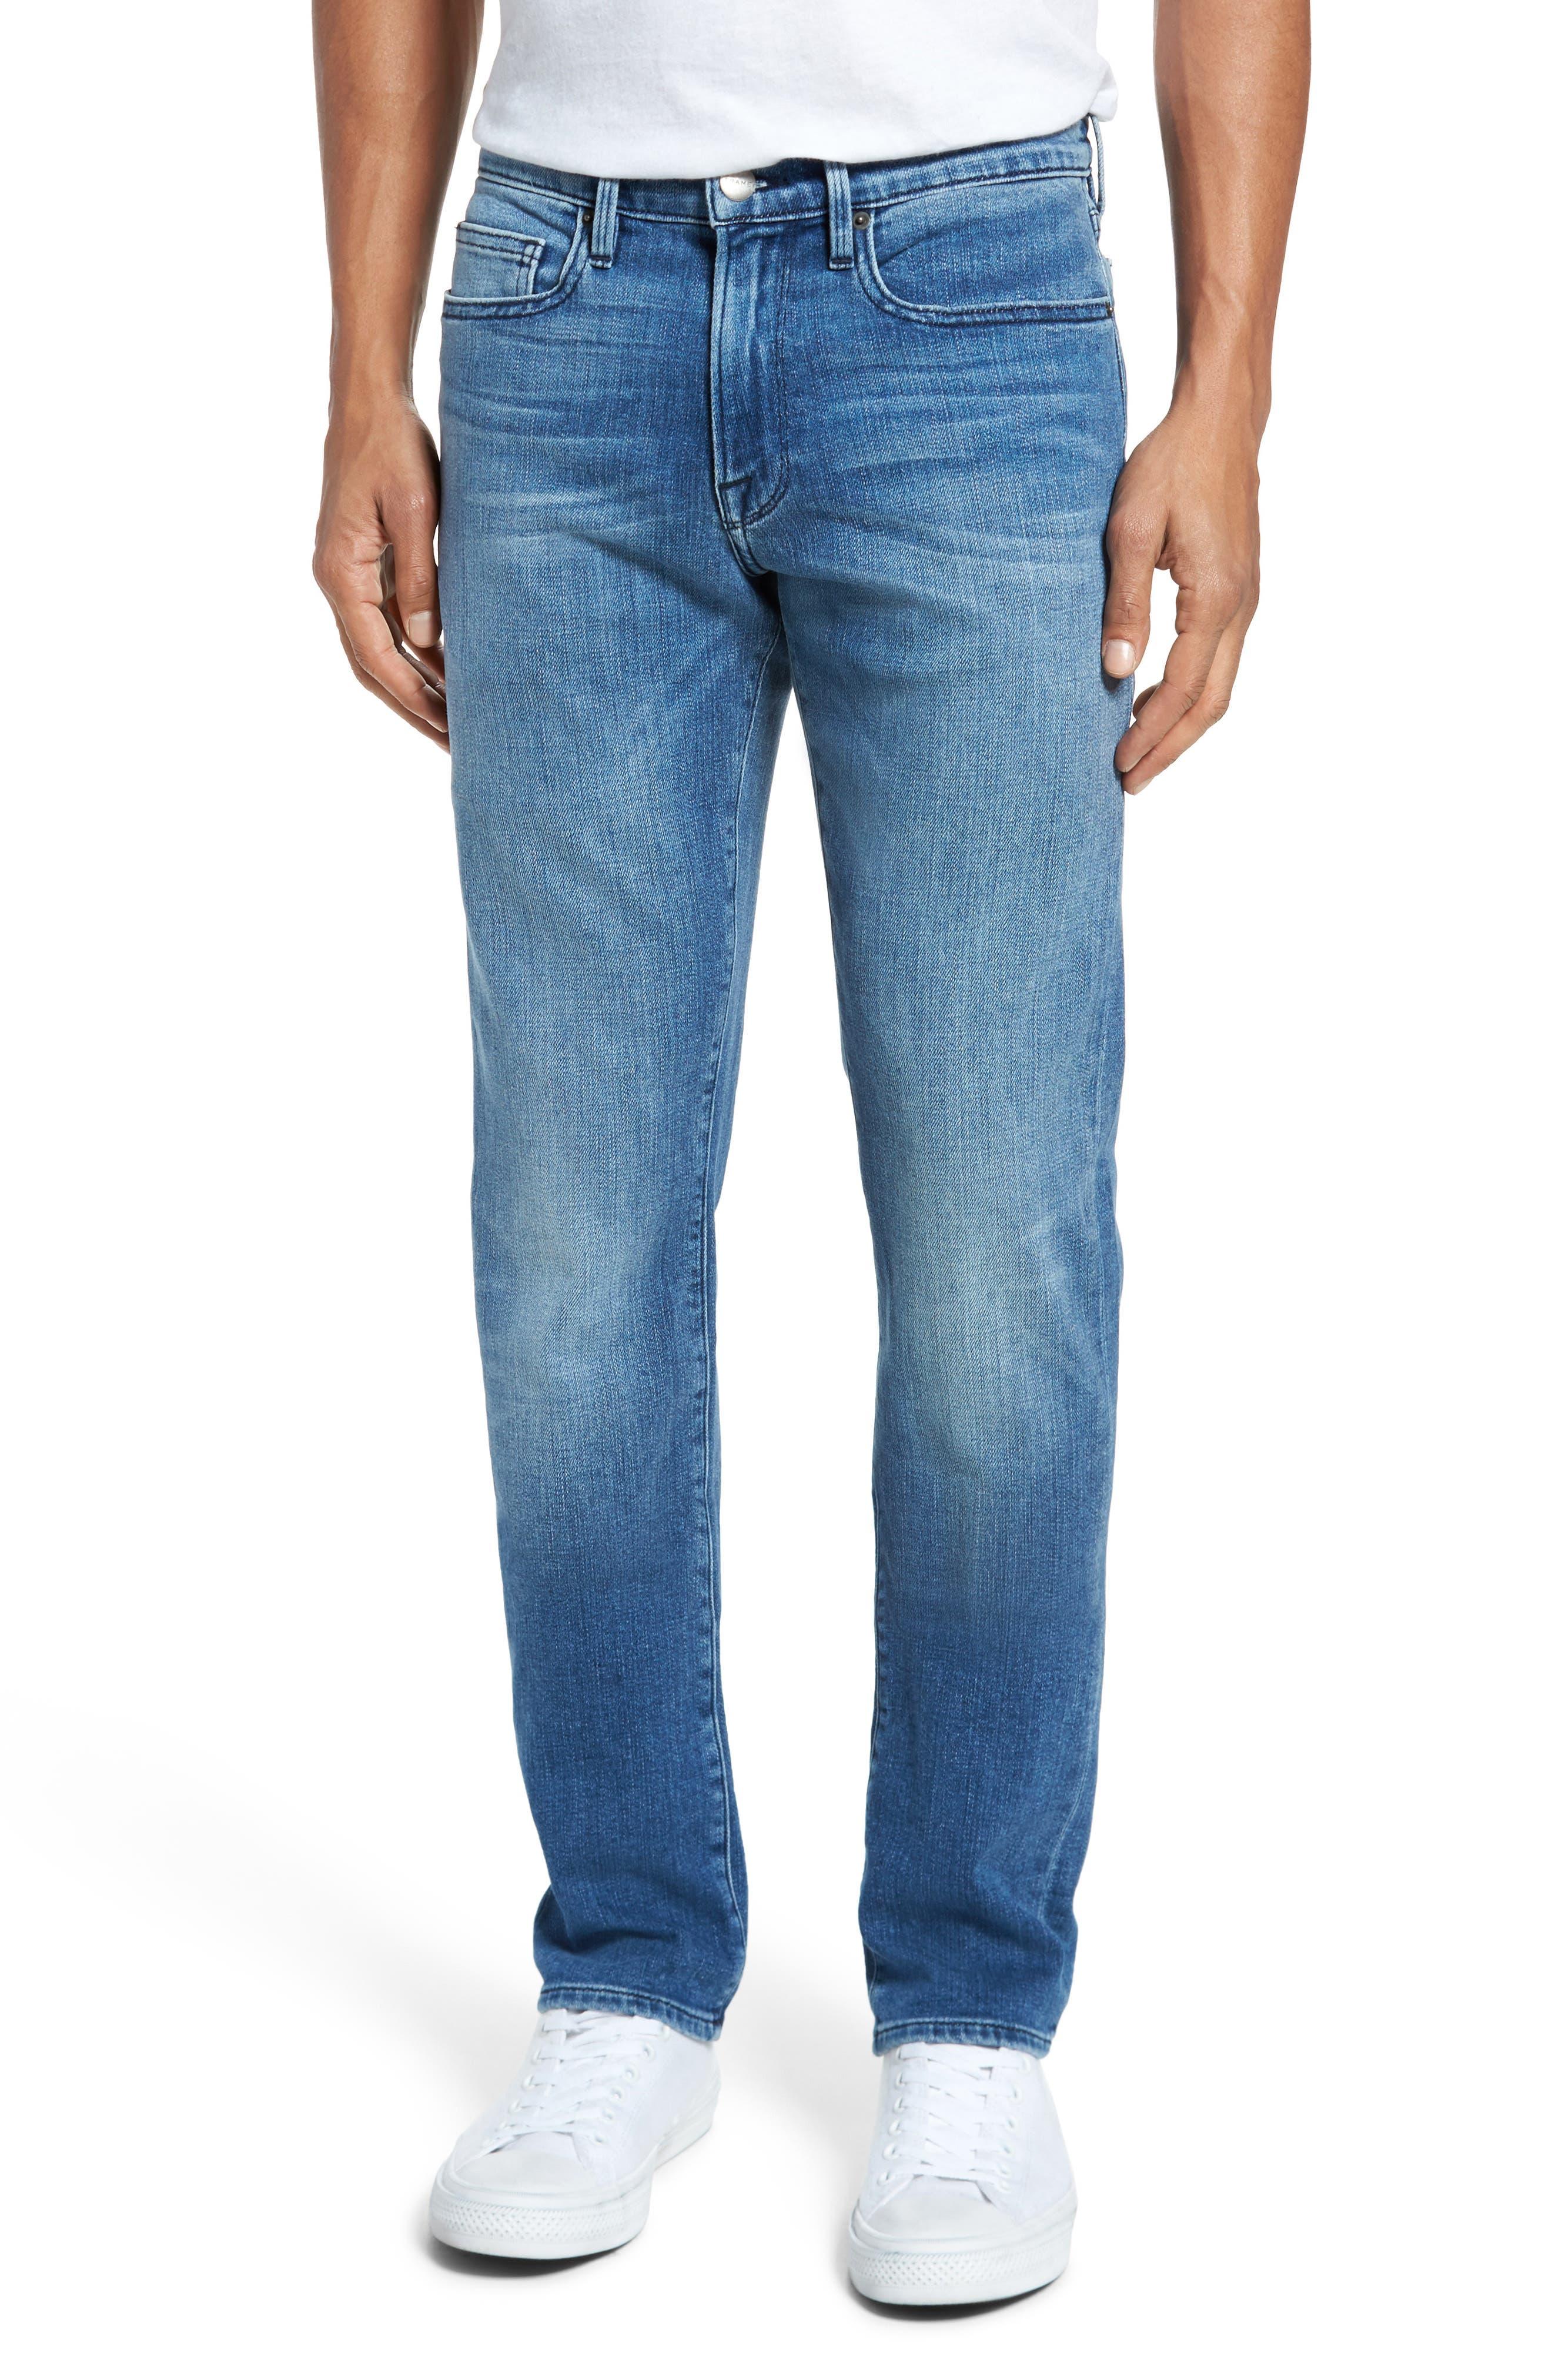 FRAME, L'Homme Slim Fit Jeans, Main thumbnail 1, color, BRADBURY